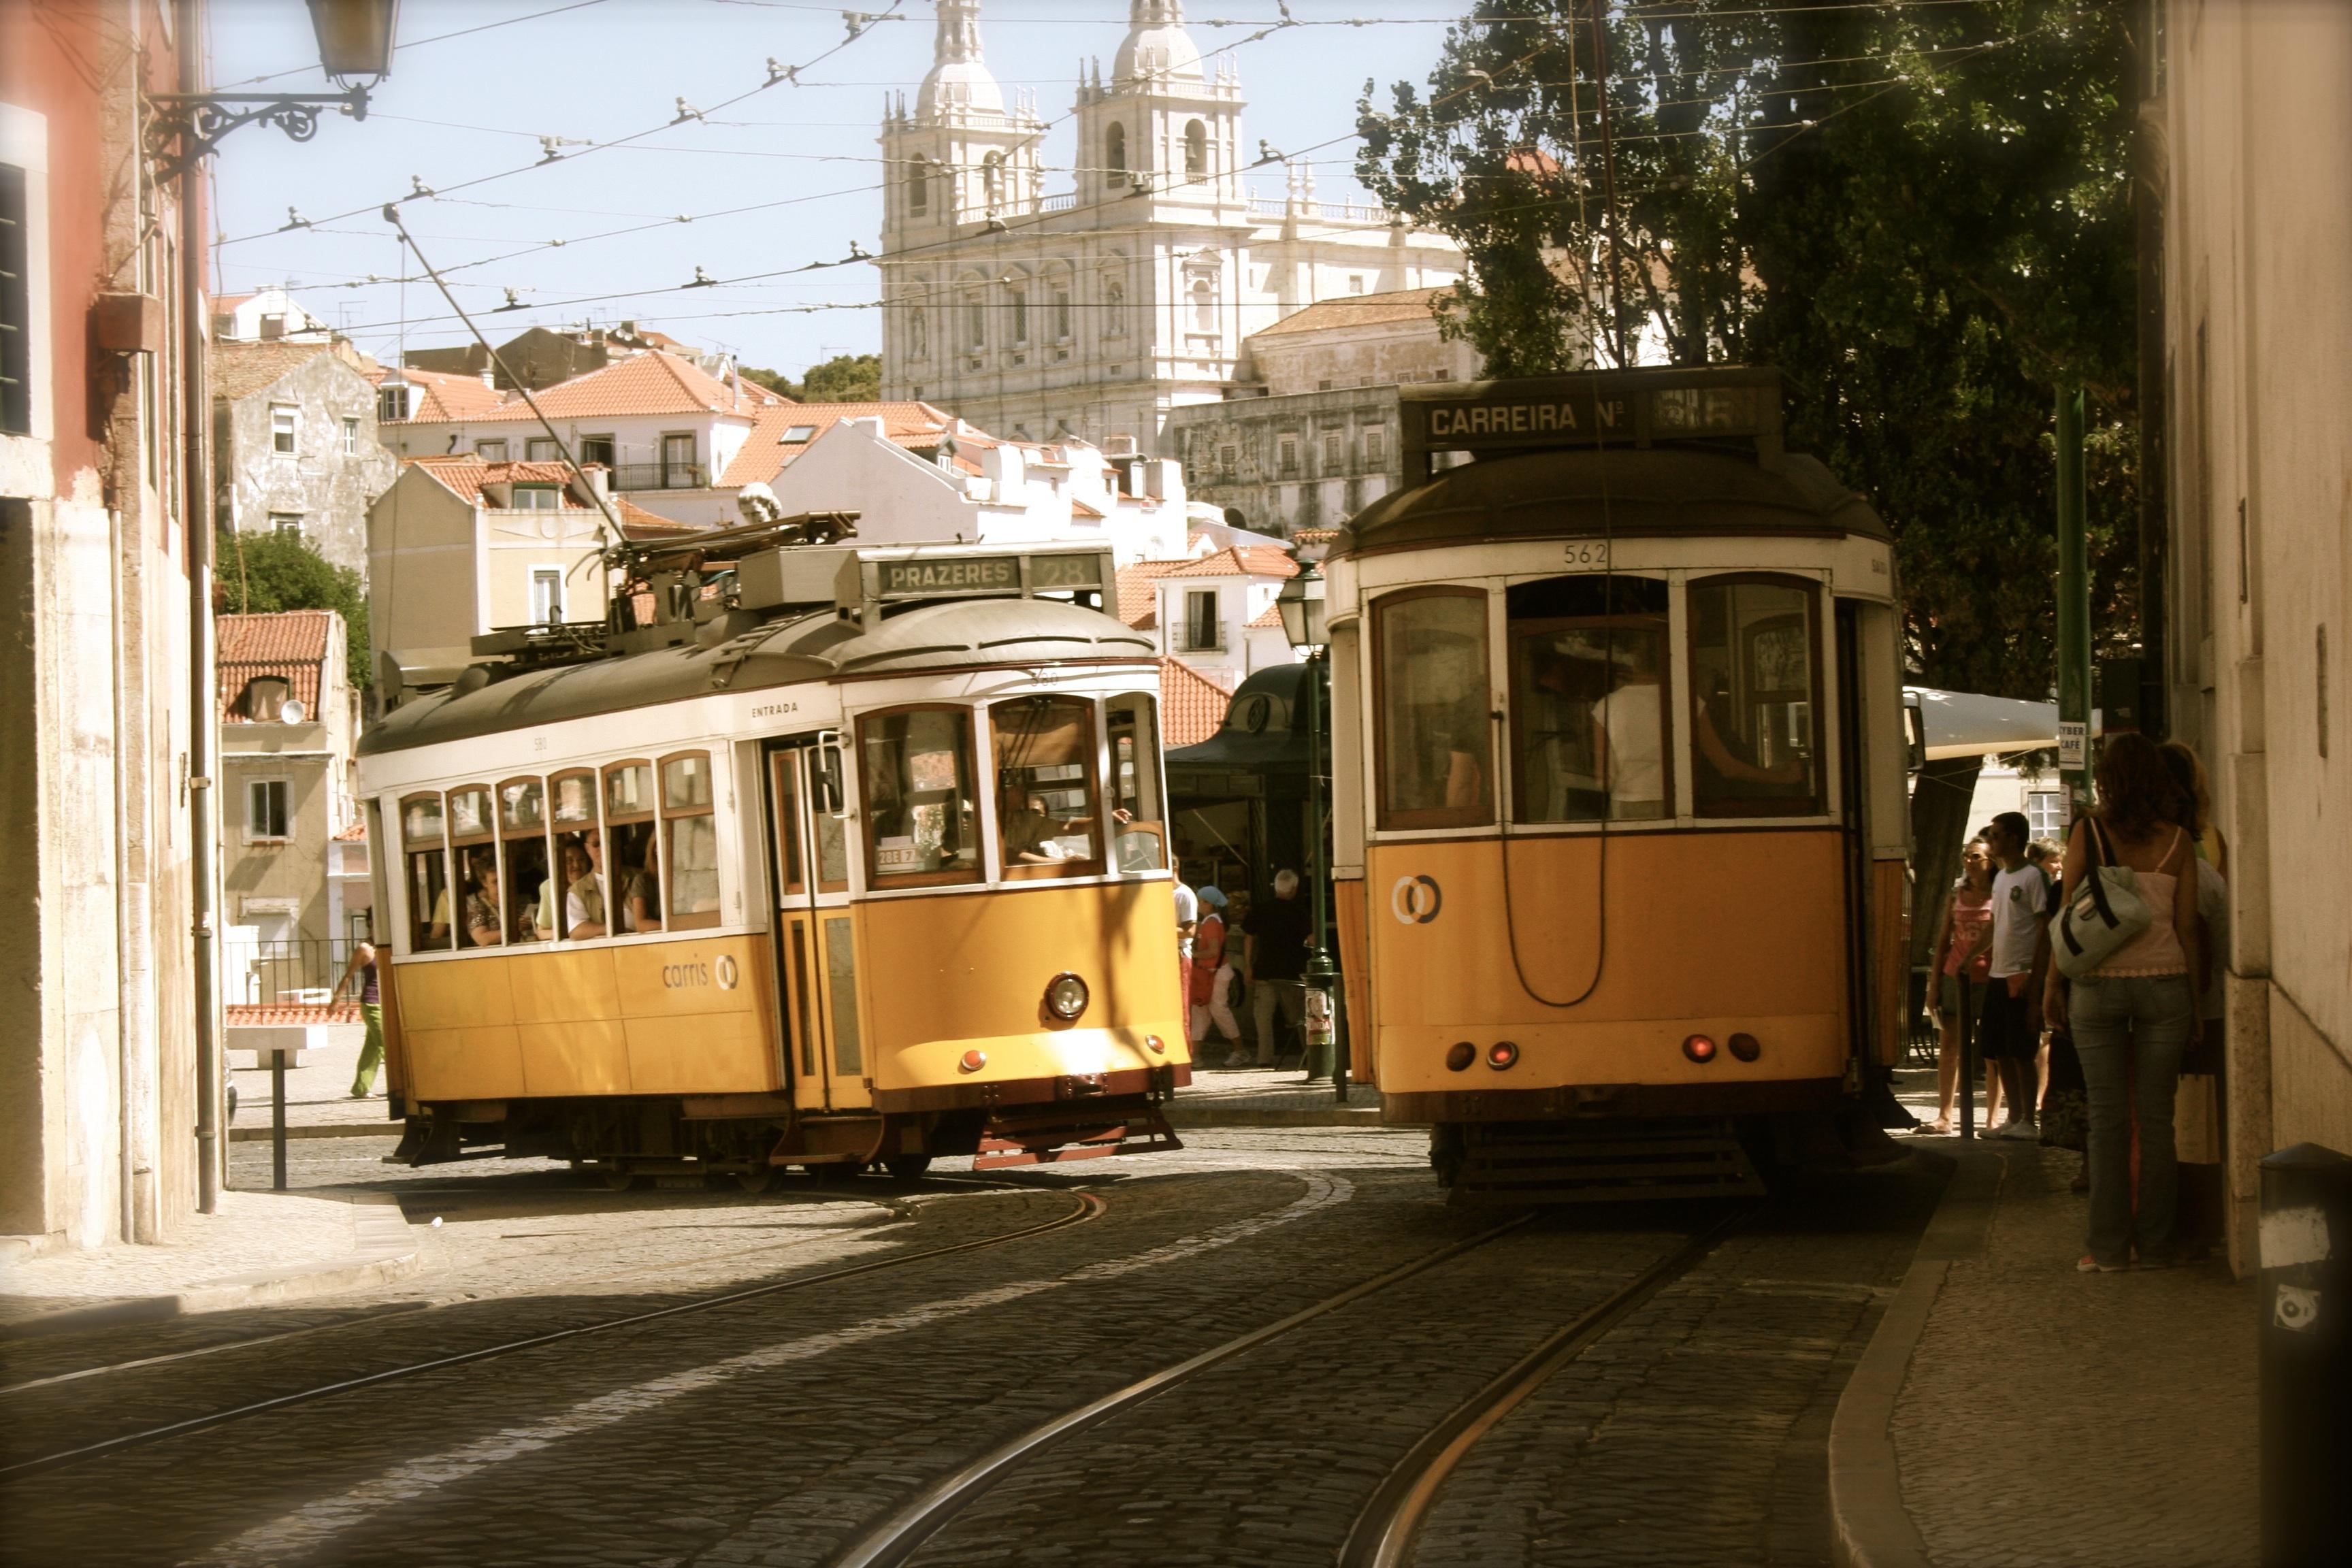 Tram, City, Path, Pathway, Rail, HQ Photo